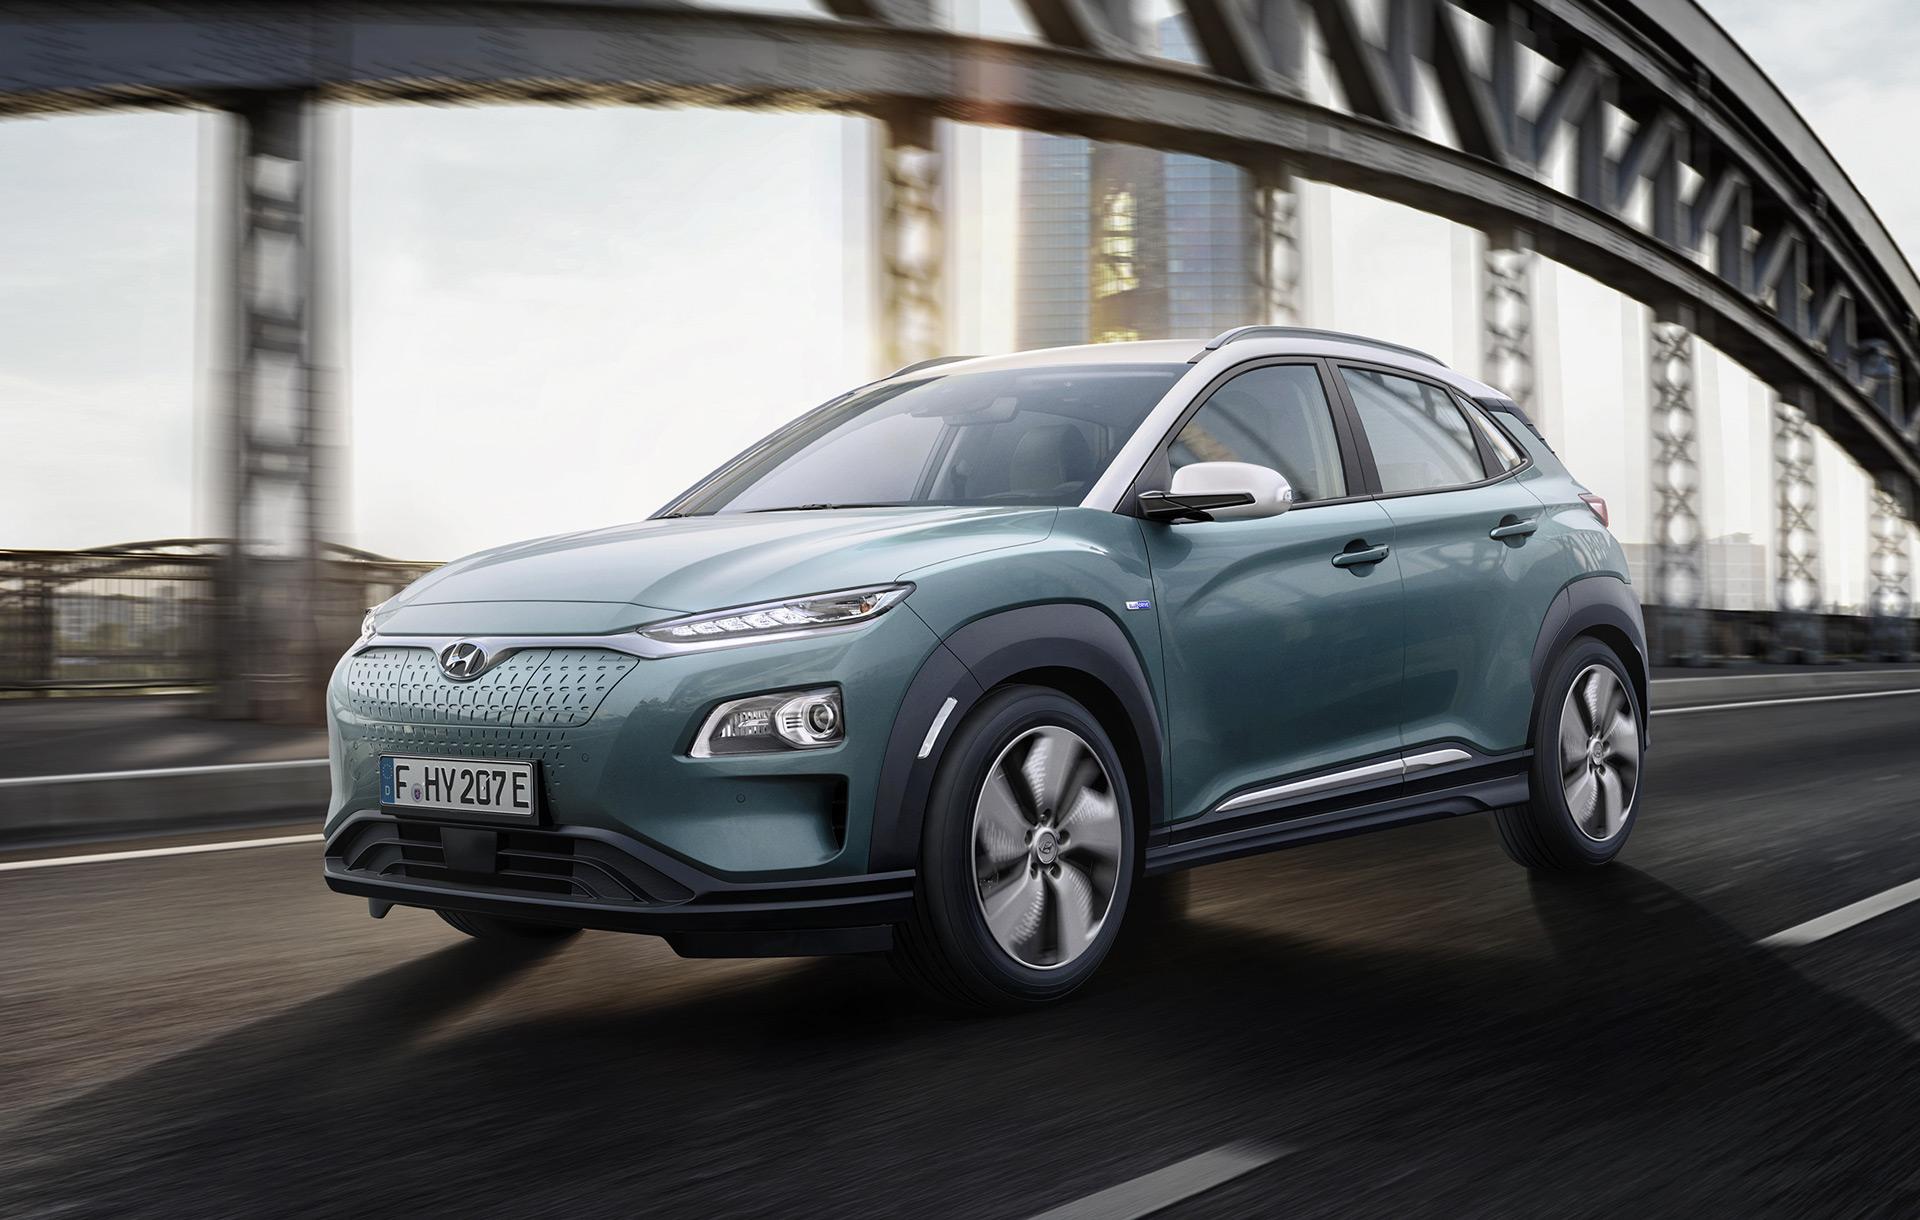 Hyundai Kona Electric Debuts Before Geneva Show 292 Mile Range From Top Model